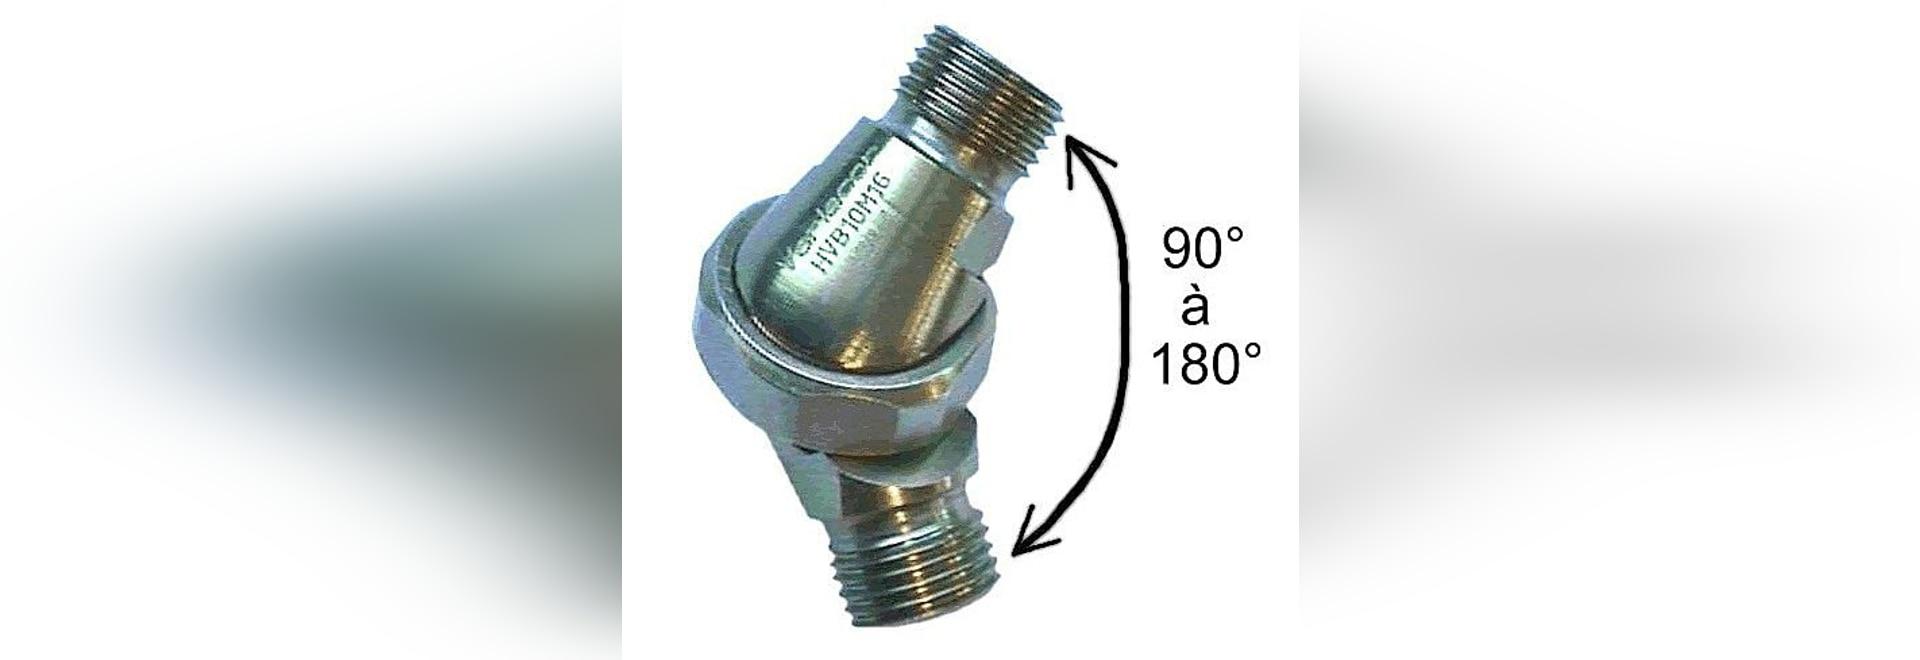 Adjustable angle hydraulic connector